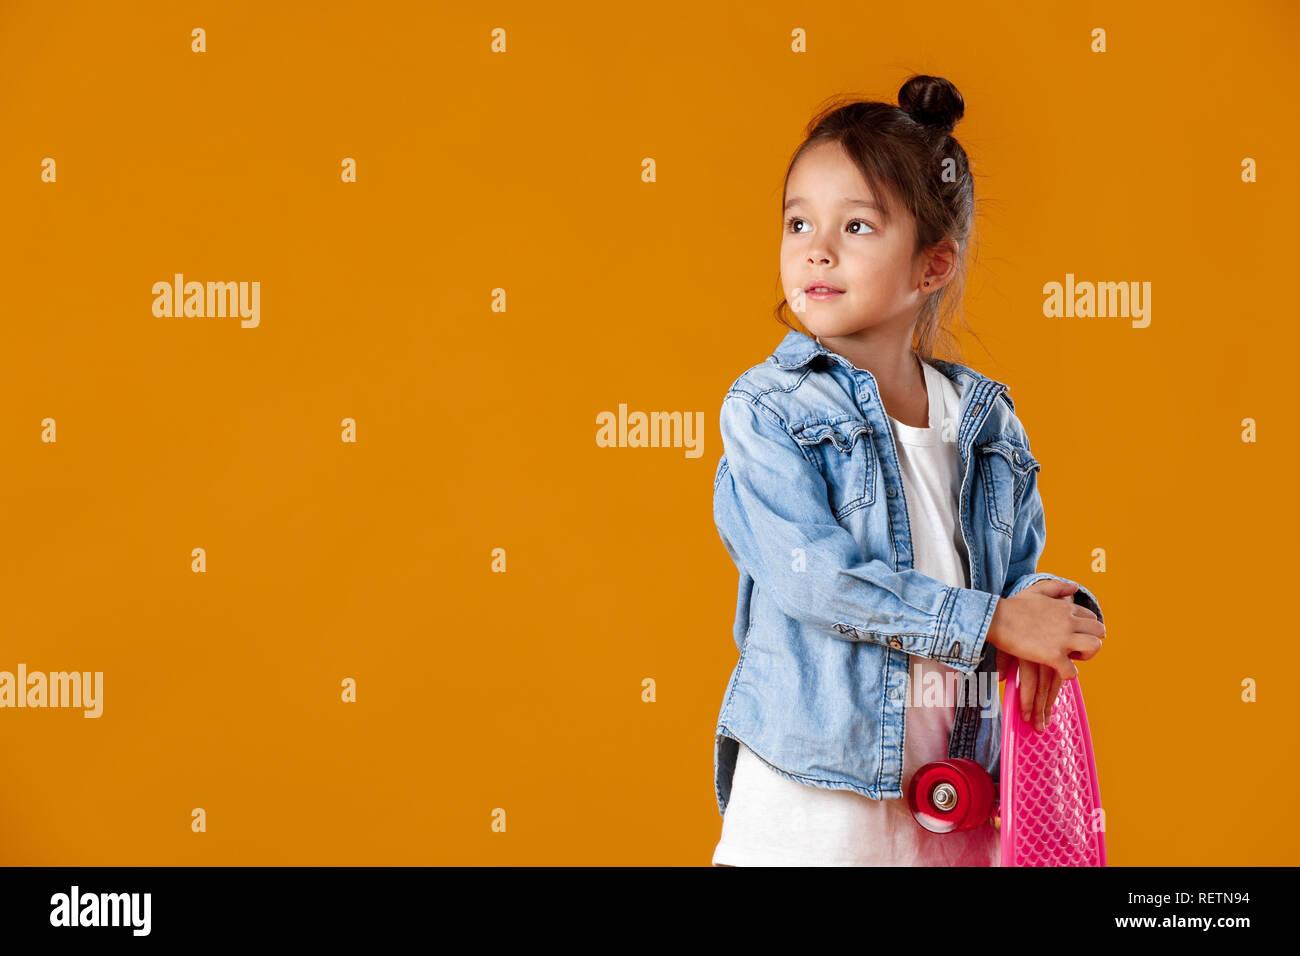 6c2317d78e4a Stylish little child girl with skateboard in denim on orange background -  Stock Image